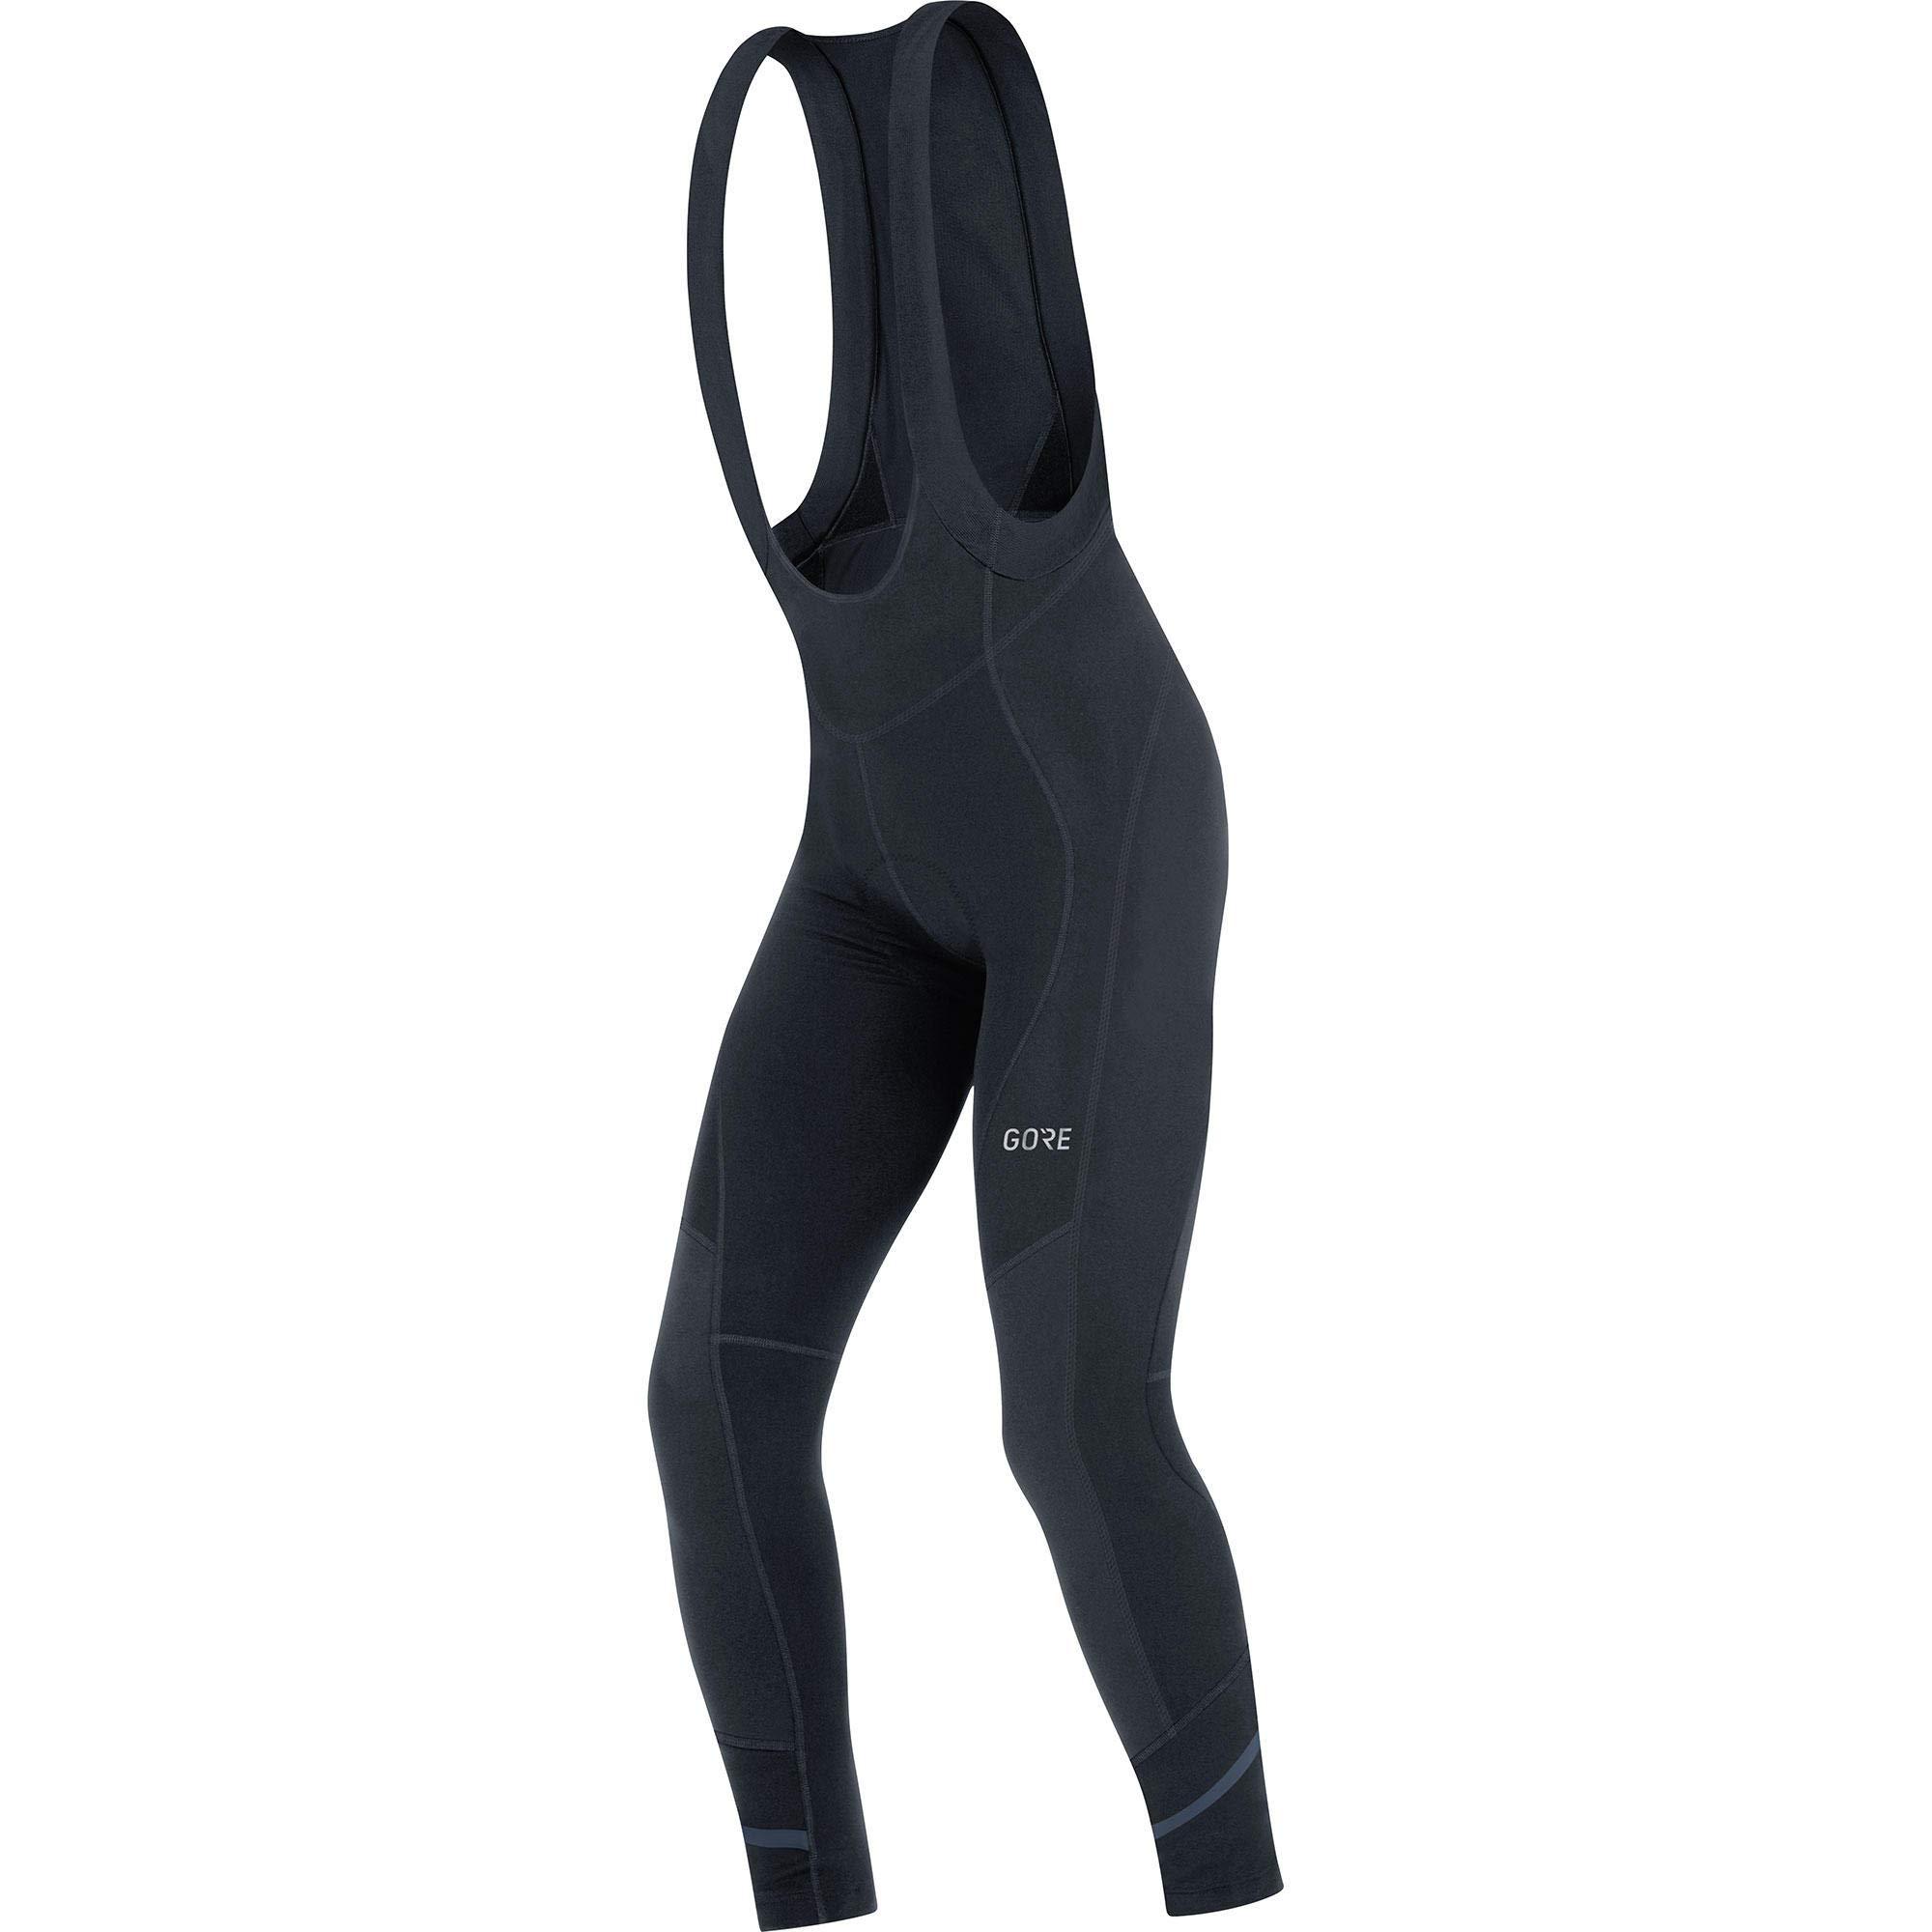 Gore Men's C5 Thermo Bib Tights+, Black, XL